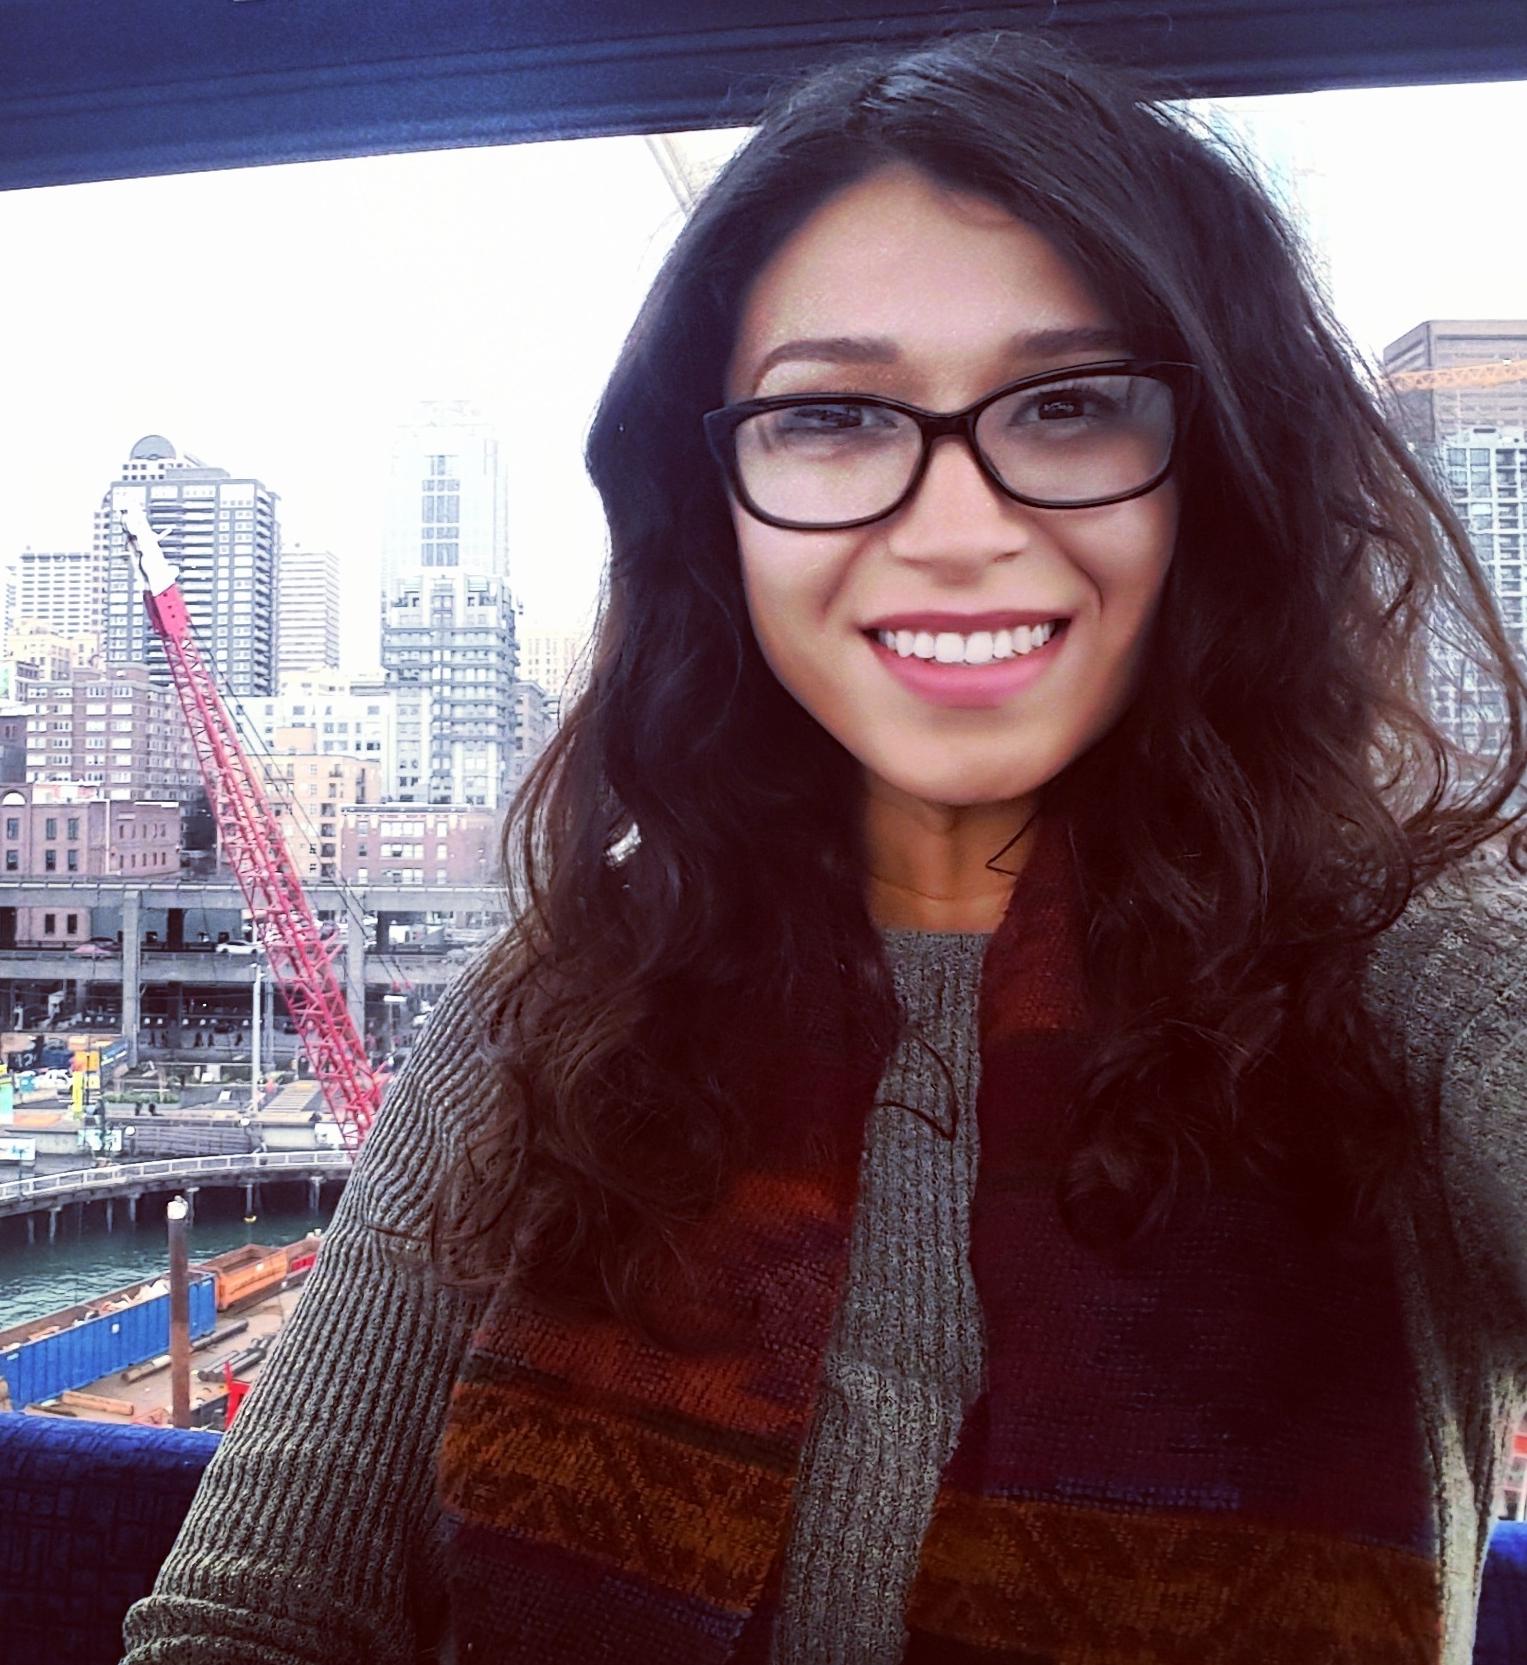 Jasmine Munoz | SpEd Inclusion Assistant & MFT Trainee